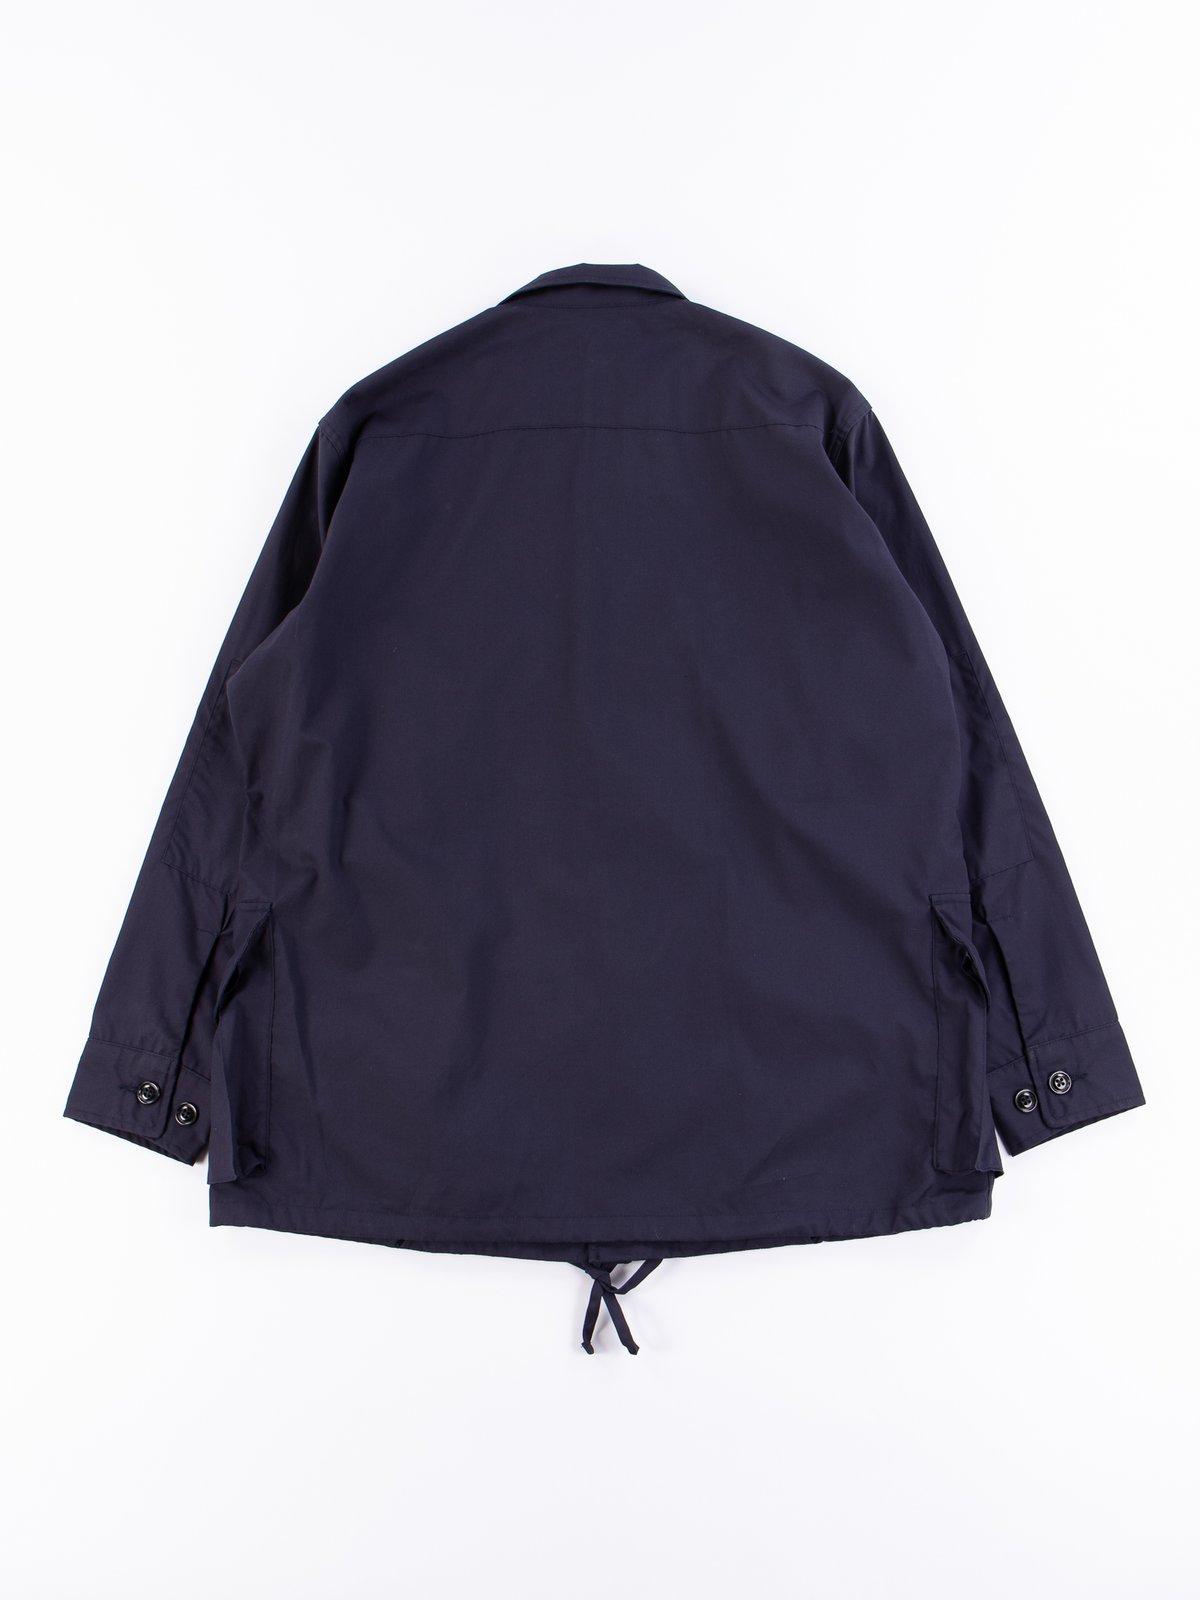 Navy Vancloth Oxford Military Half Coat Type B Exclusive - Image 6